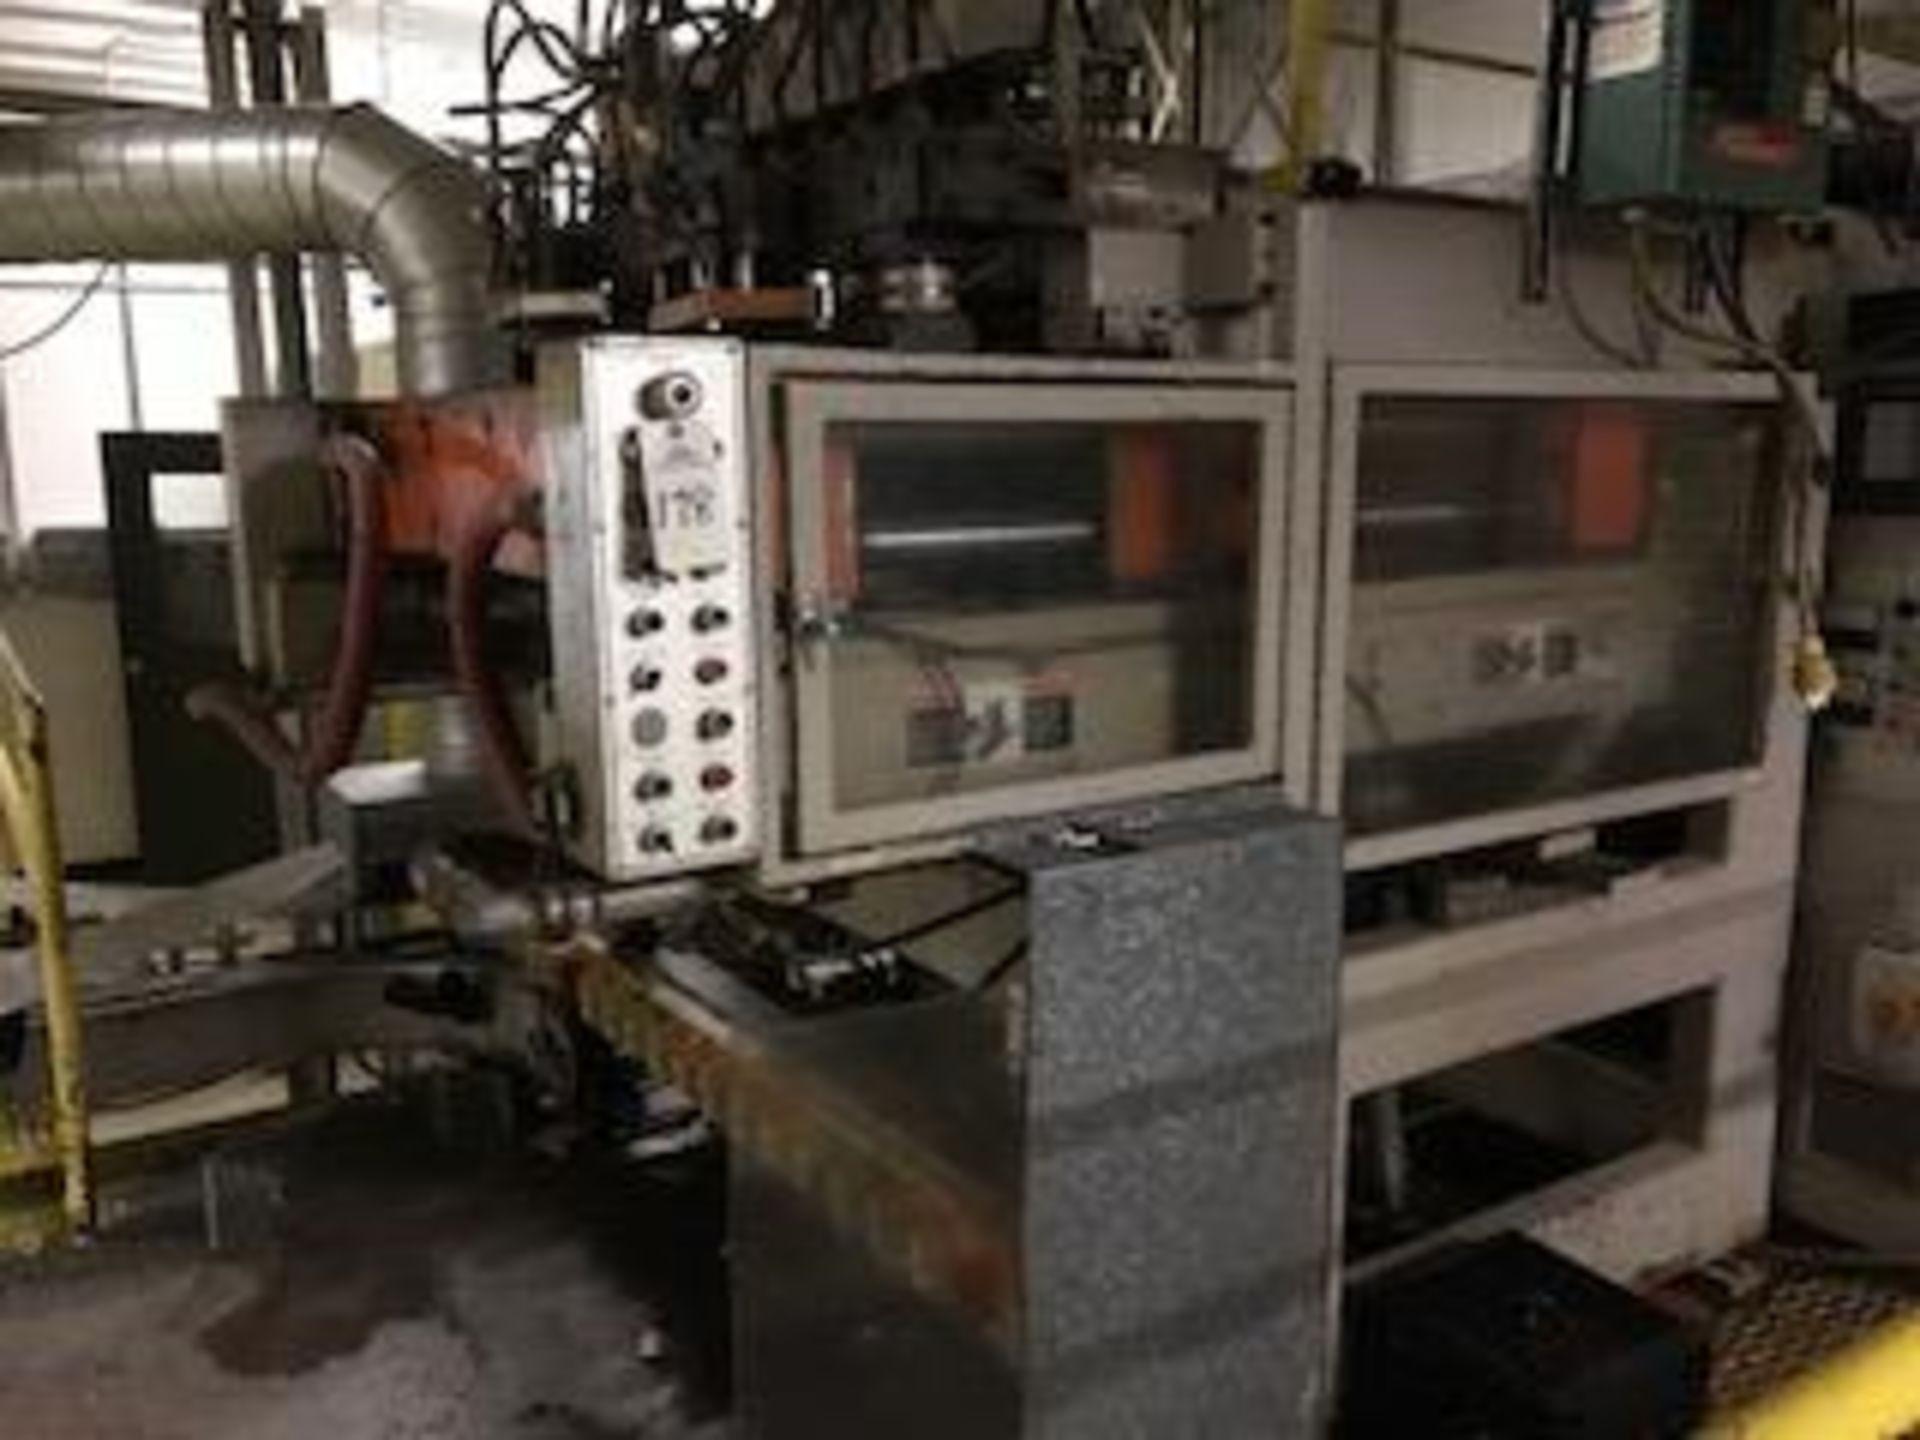 Uniloy Milacron 12-Head Blow Molding Machine Model RS13500, S/N 89105 | Rig Fee: $14500